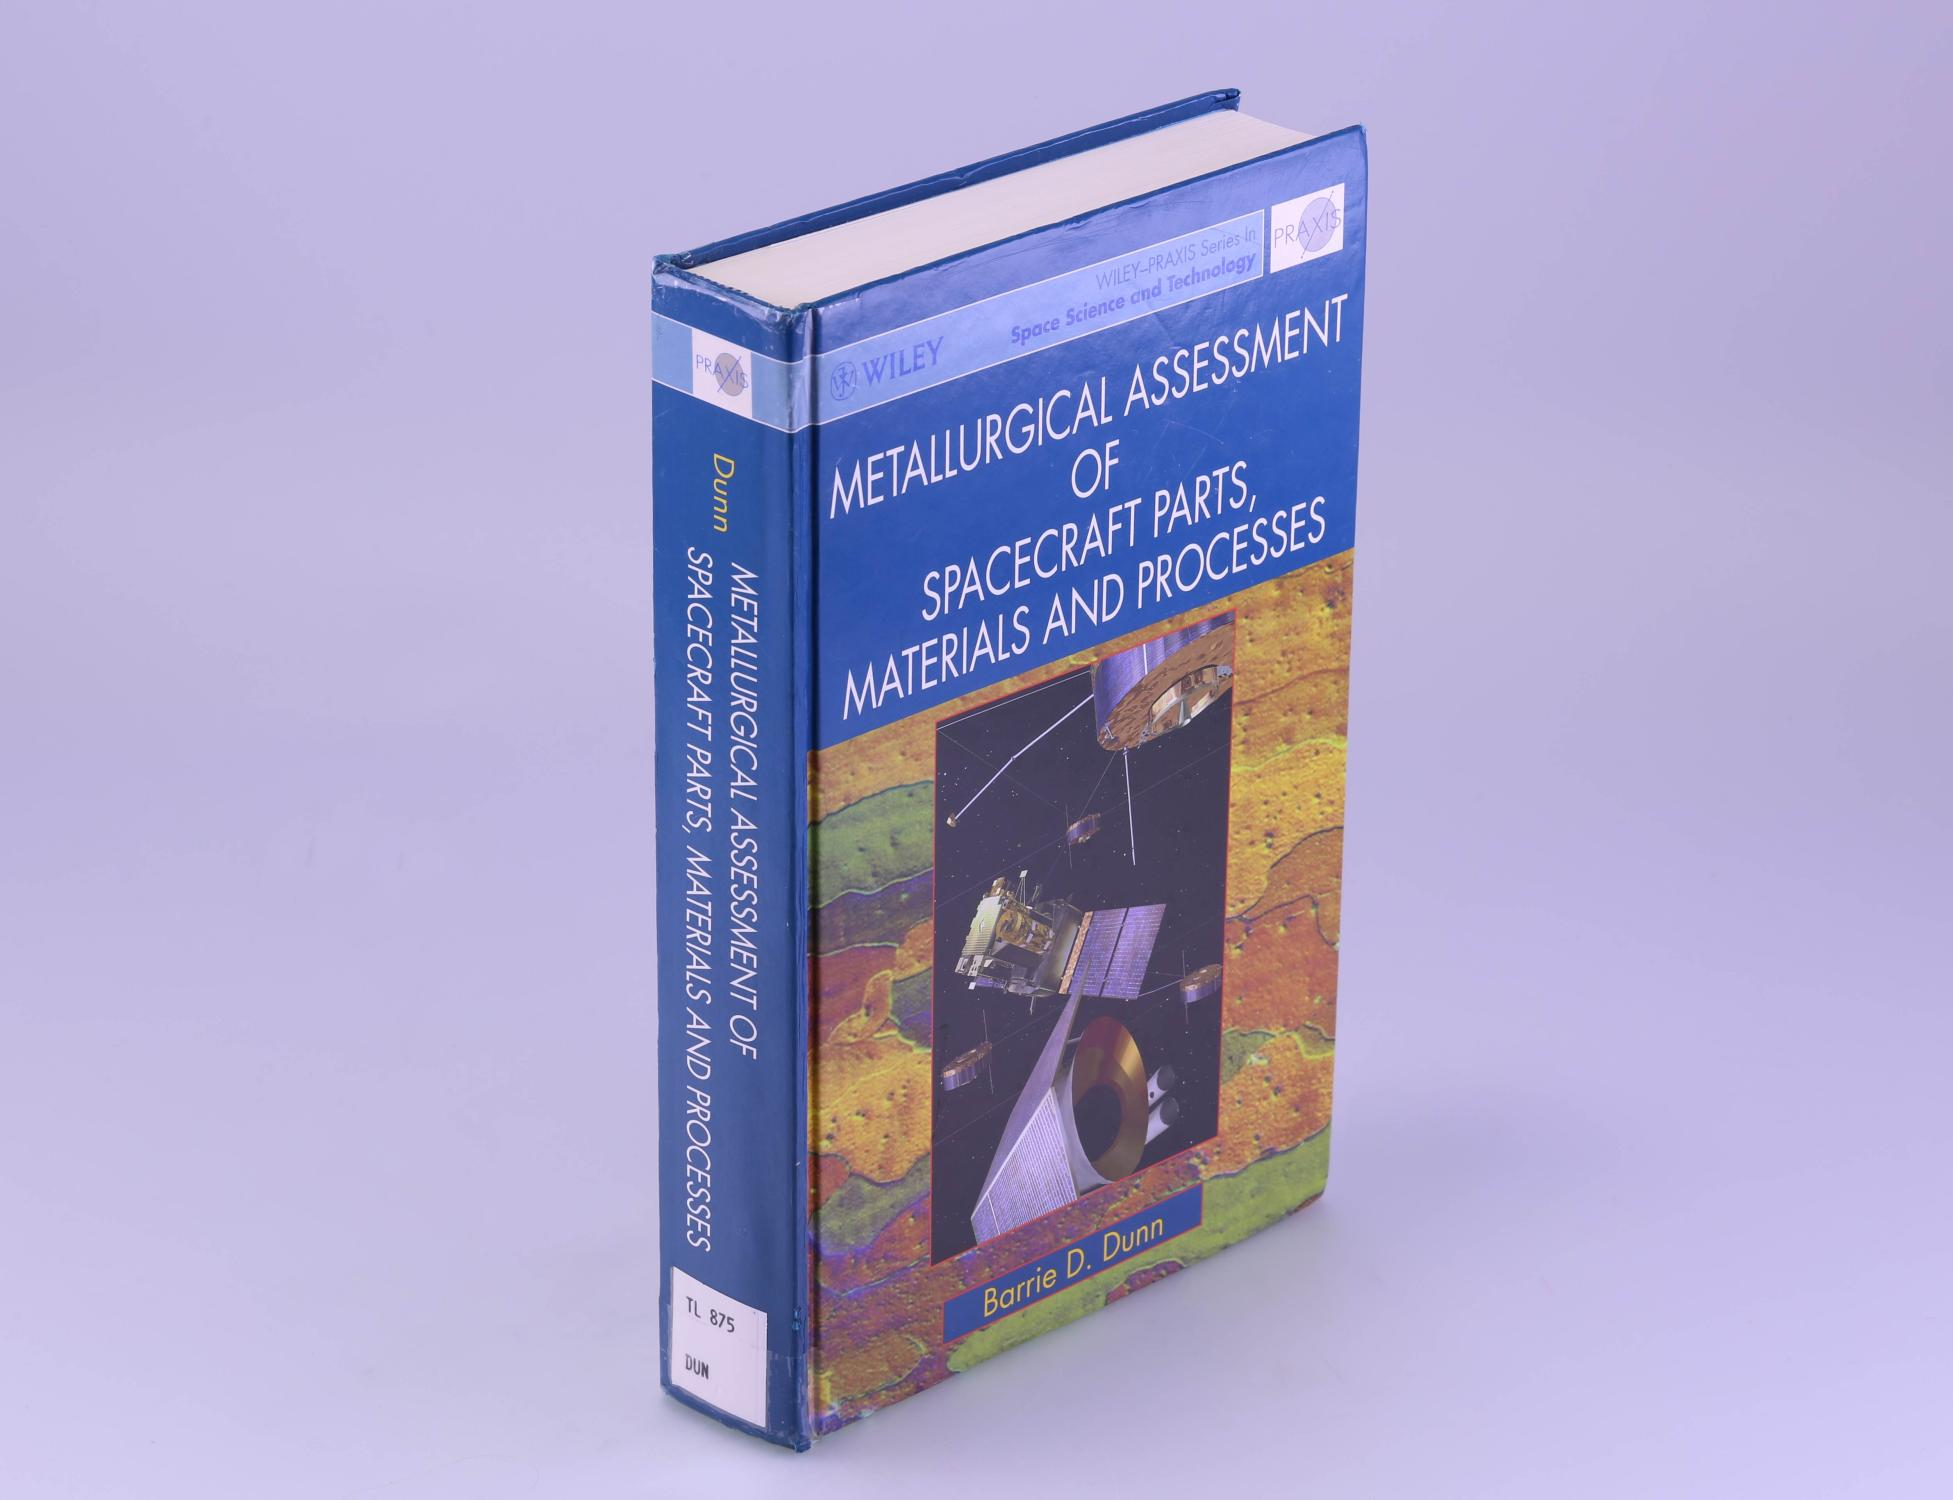 Metallurgical Assessment of Spacecraft Parts